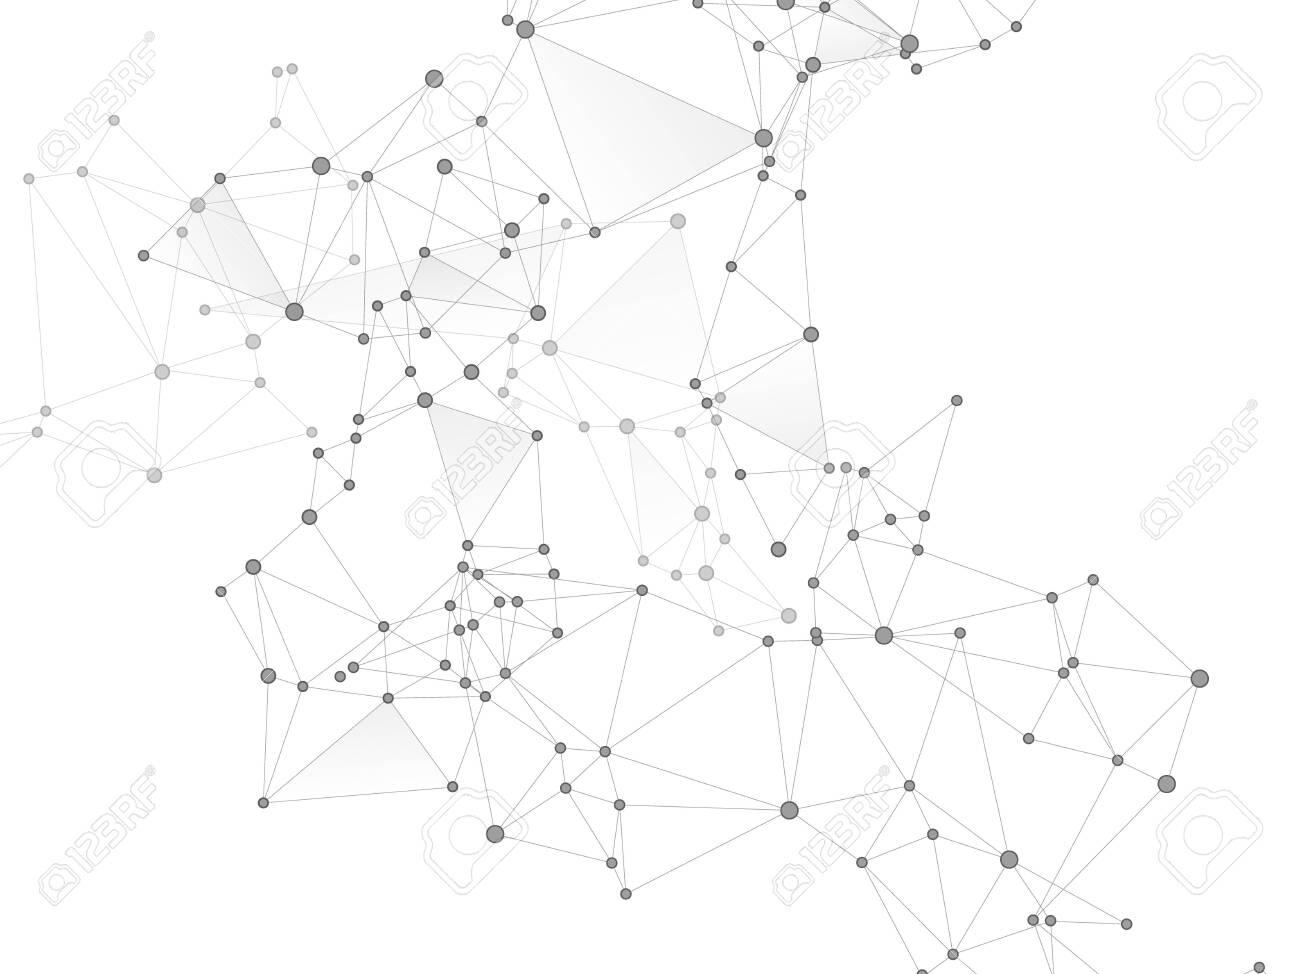 Big data cloud scientific concept. Network nodes greyscale plexus background. Information analytics graphics. Tech vector big data visualization cloud structure. Fractal hub nodes connected by lines. - 131988044